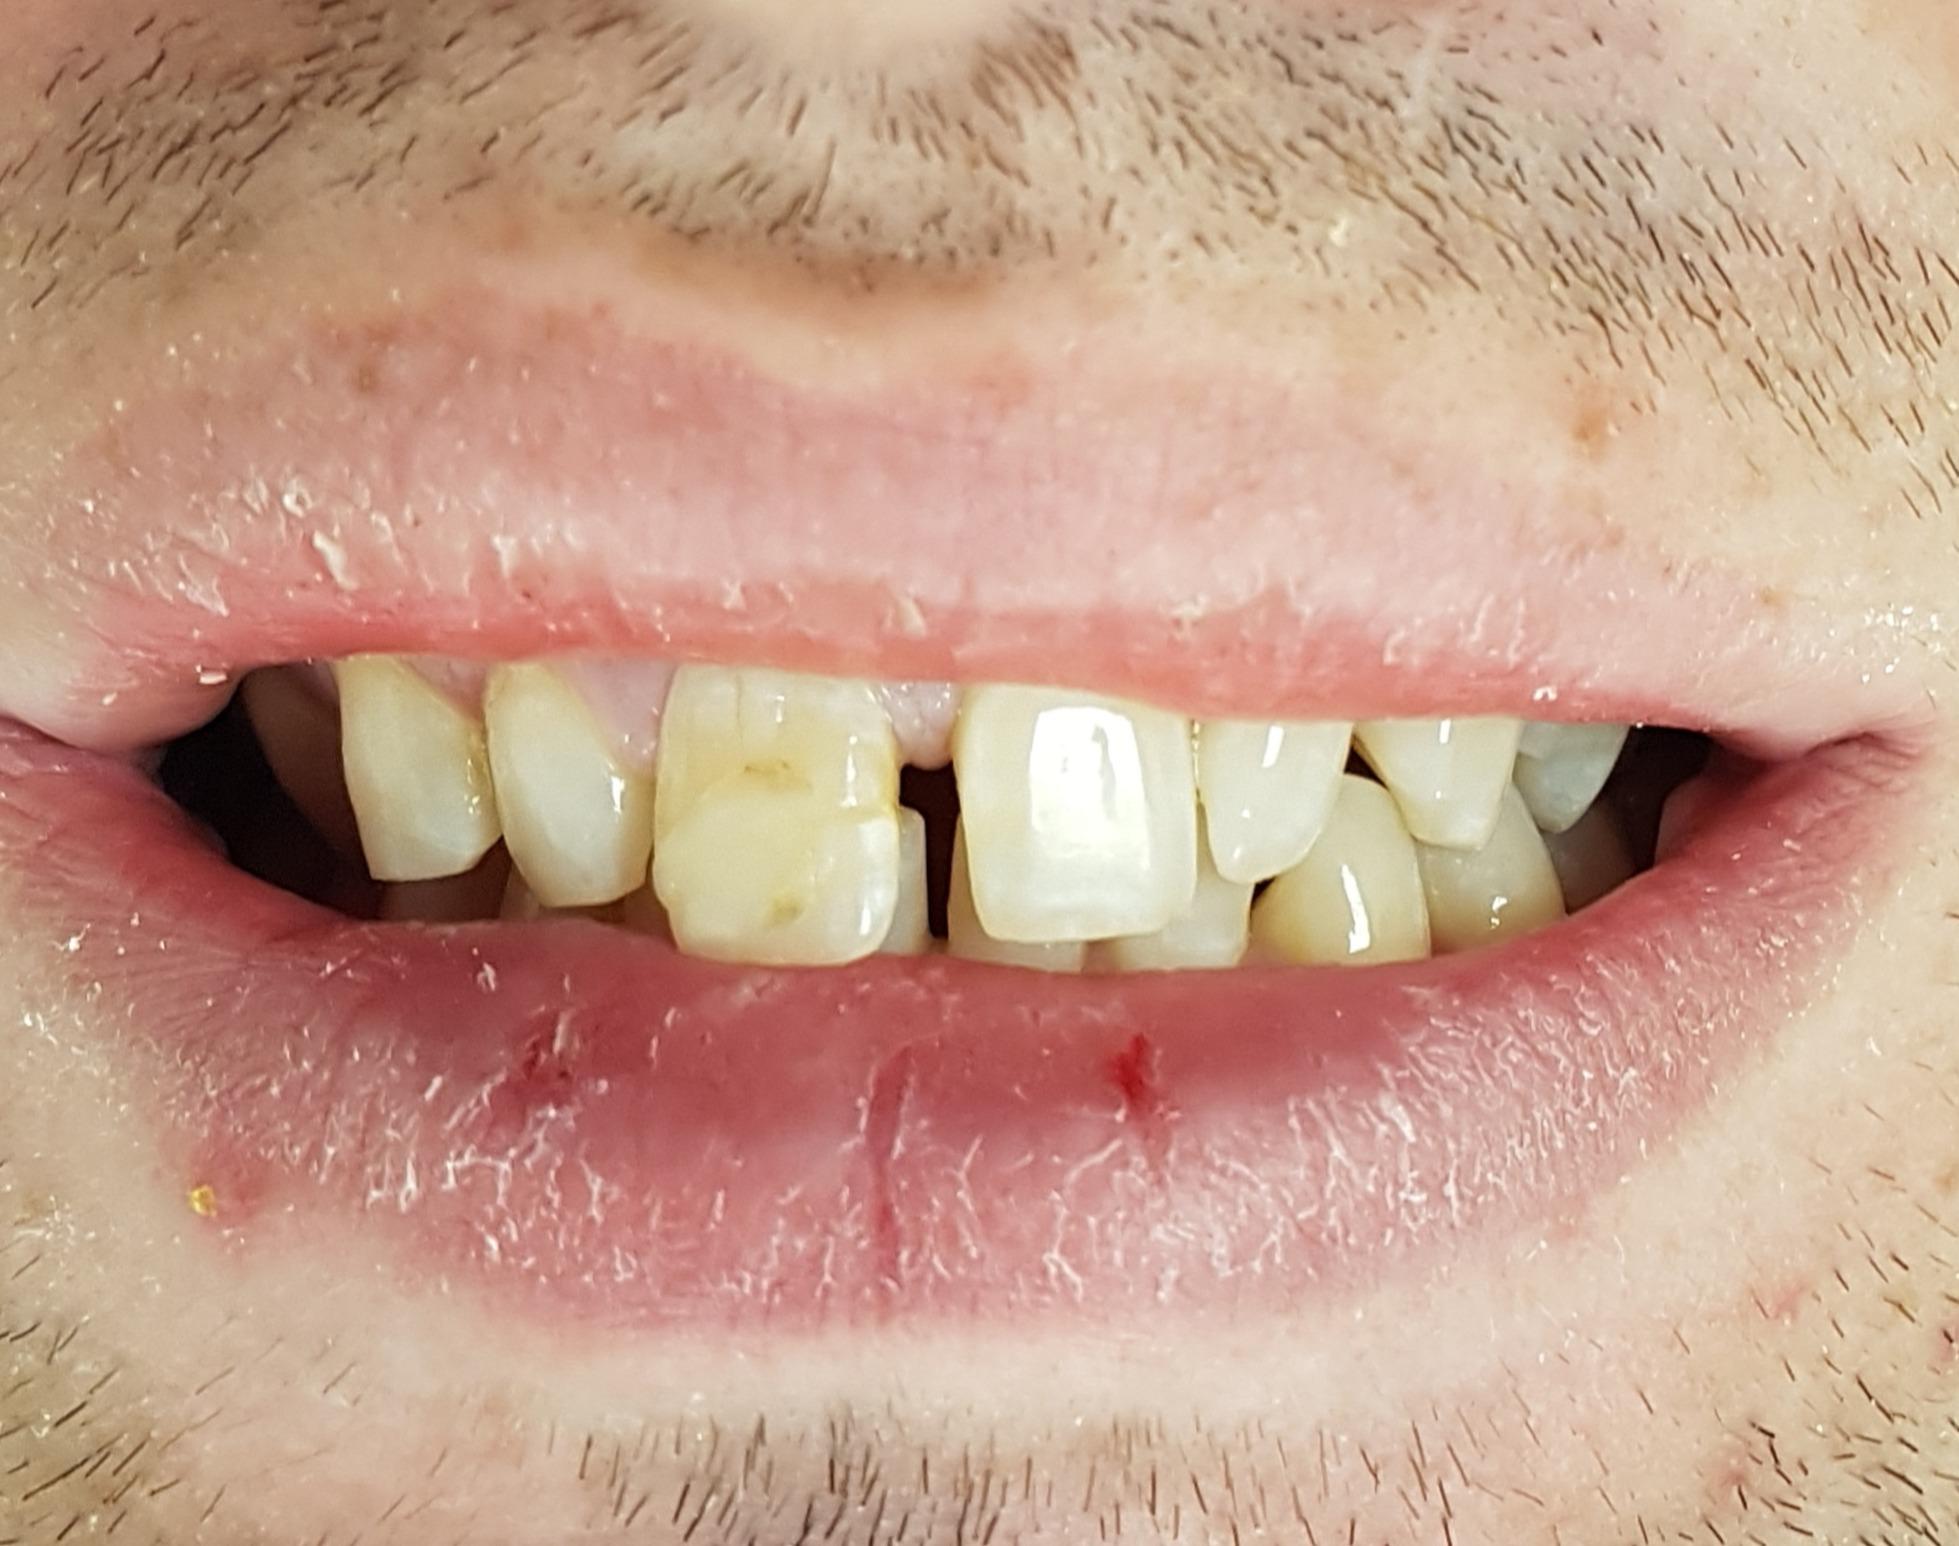 Gaps and yellow teeth